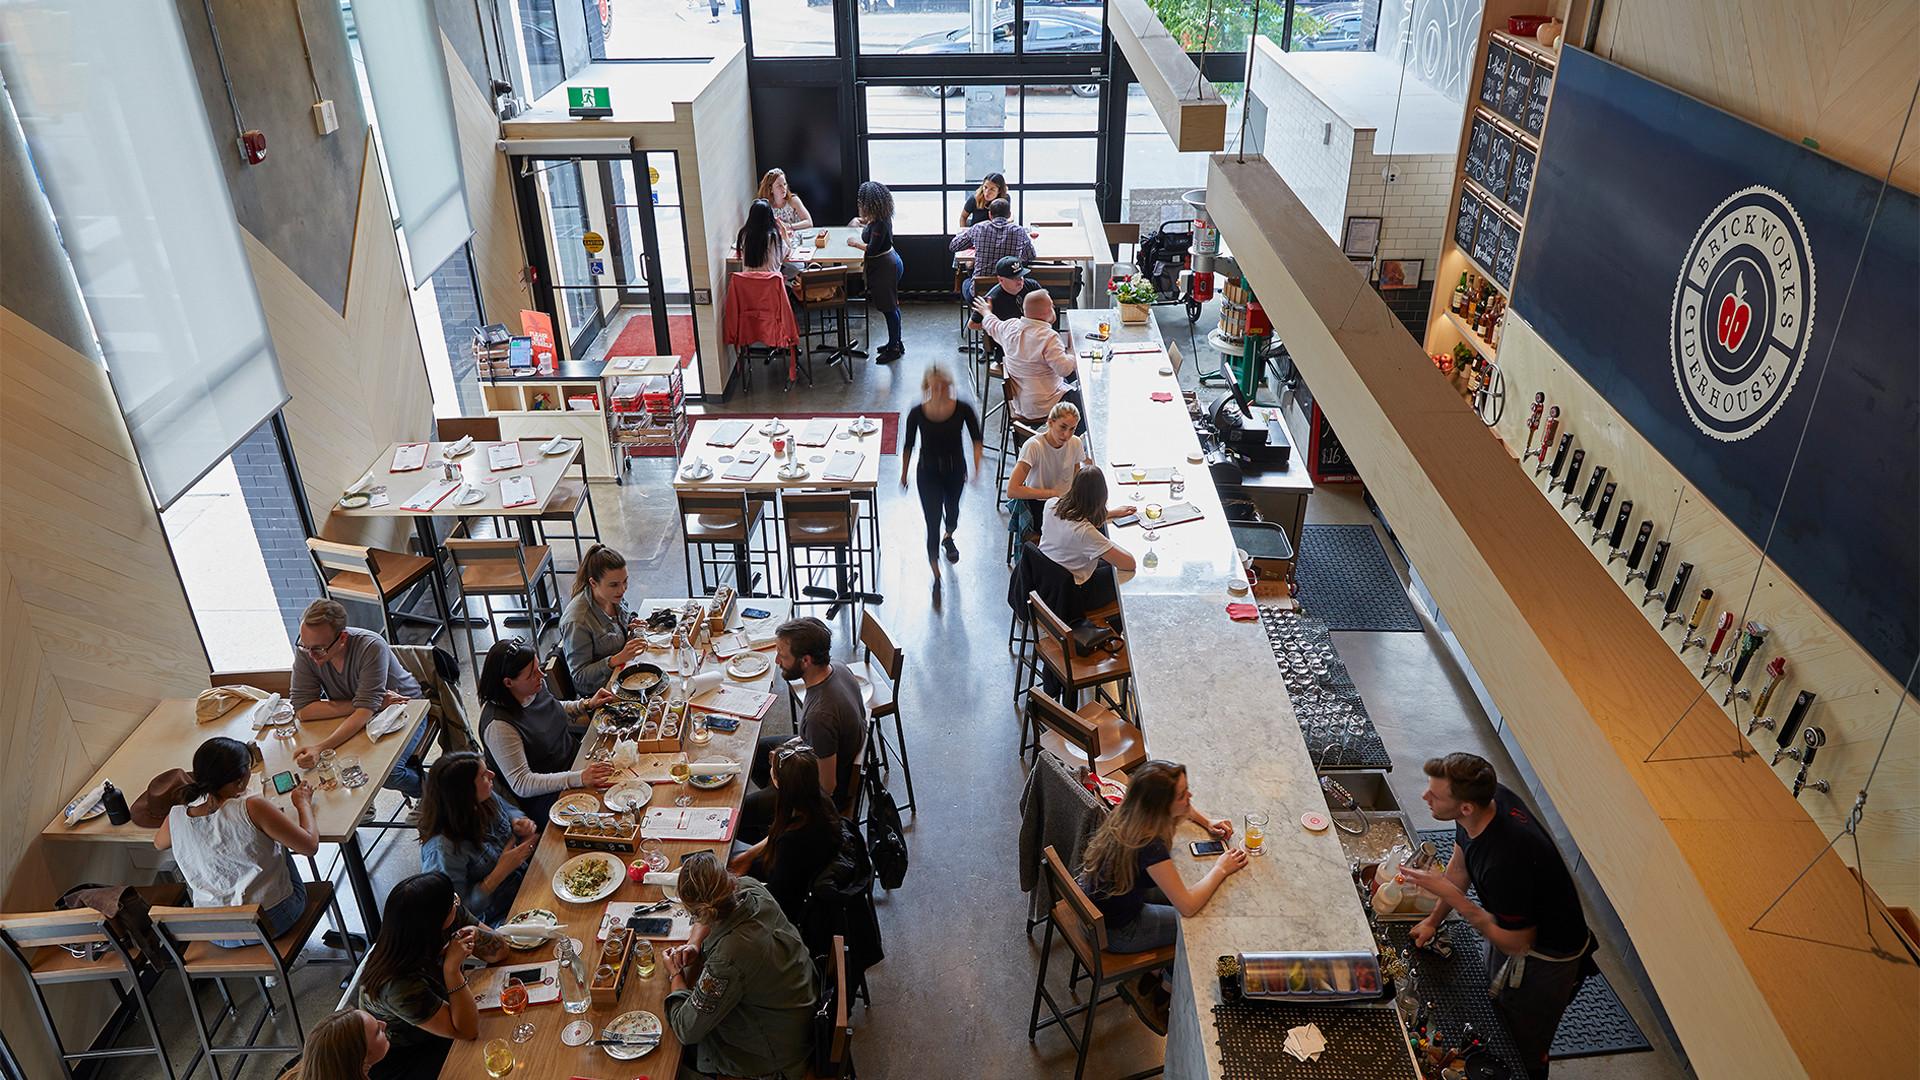 Brickworks Ciderhouse Toronto craft cider | Dining inside (pre-COVID)